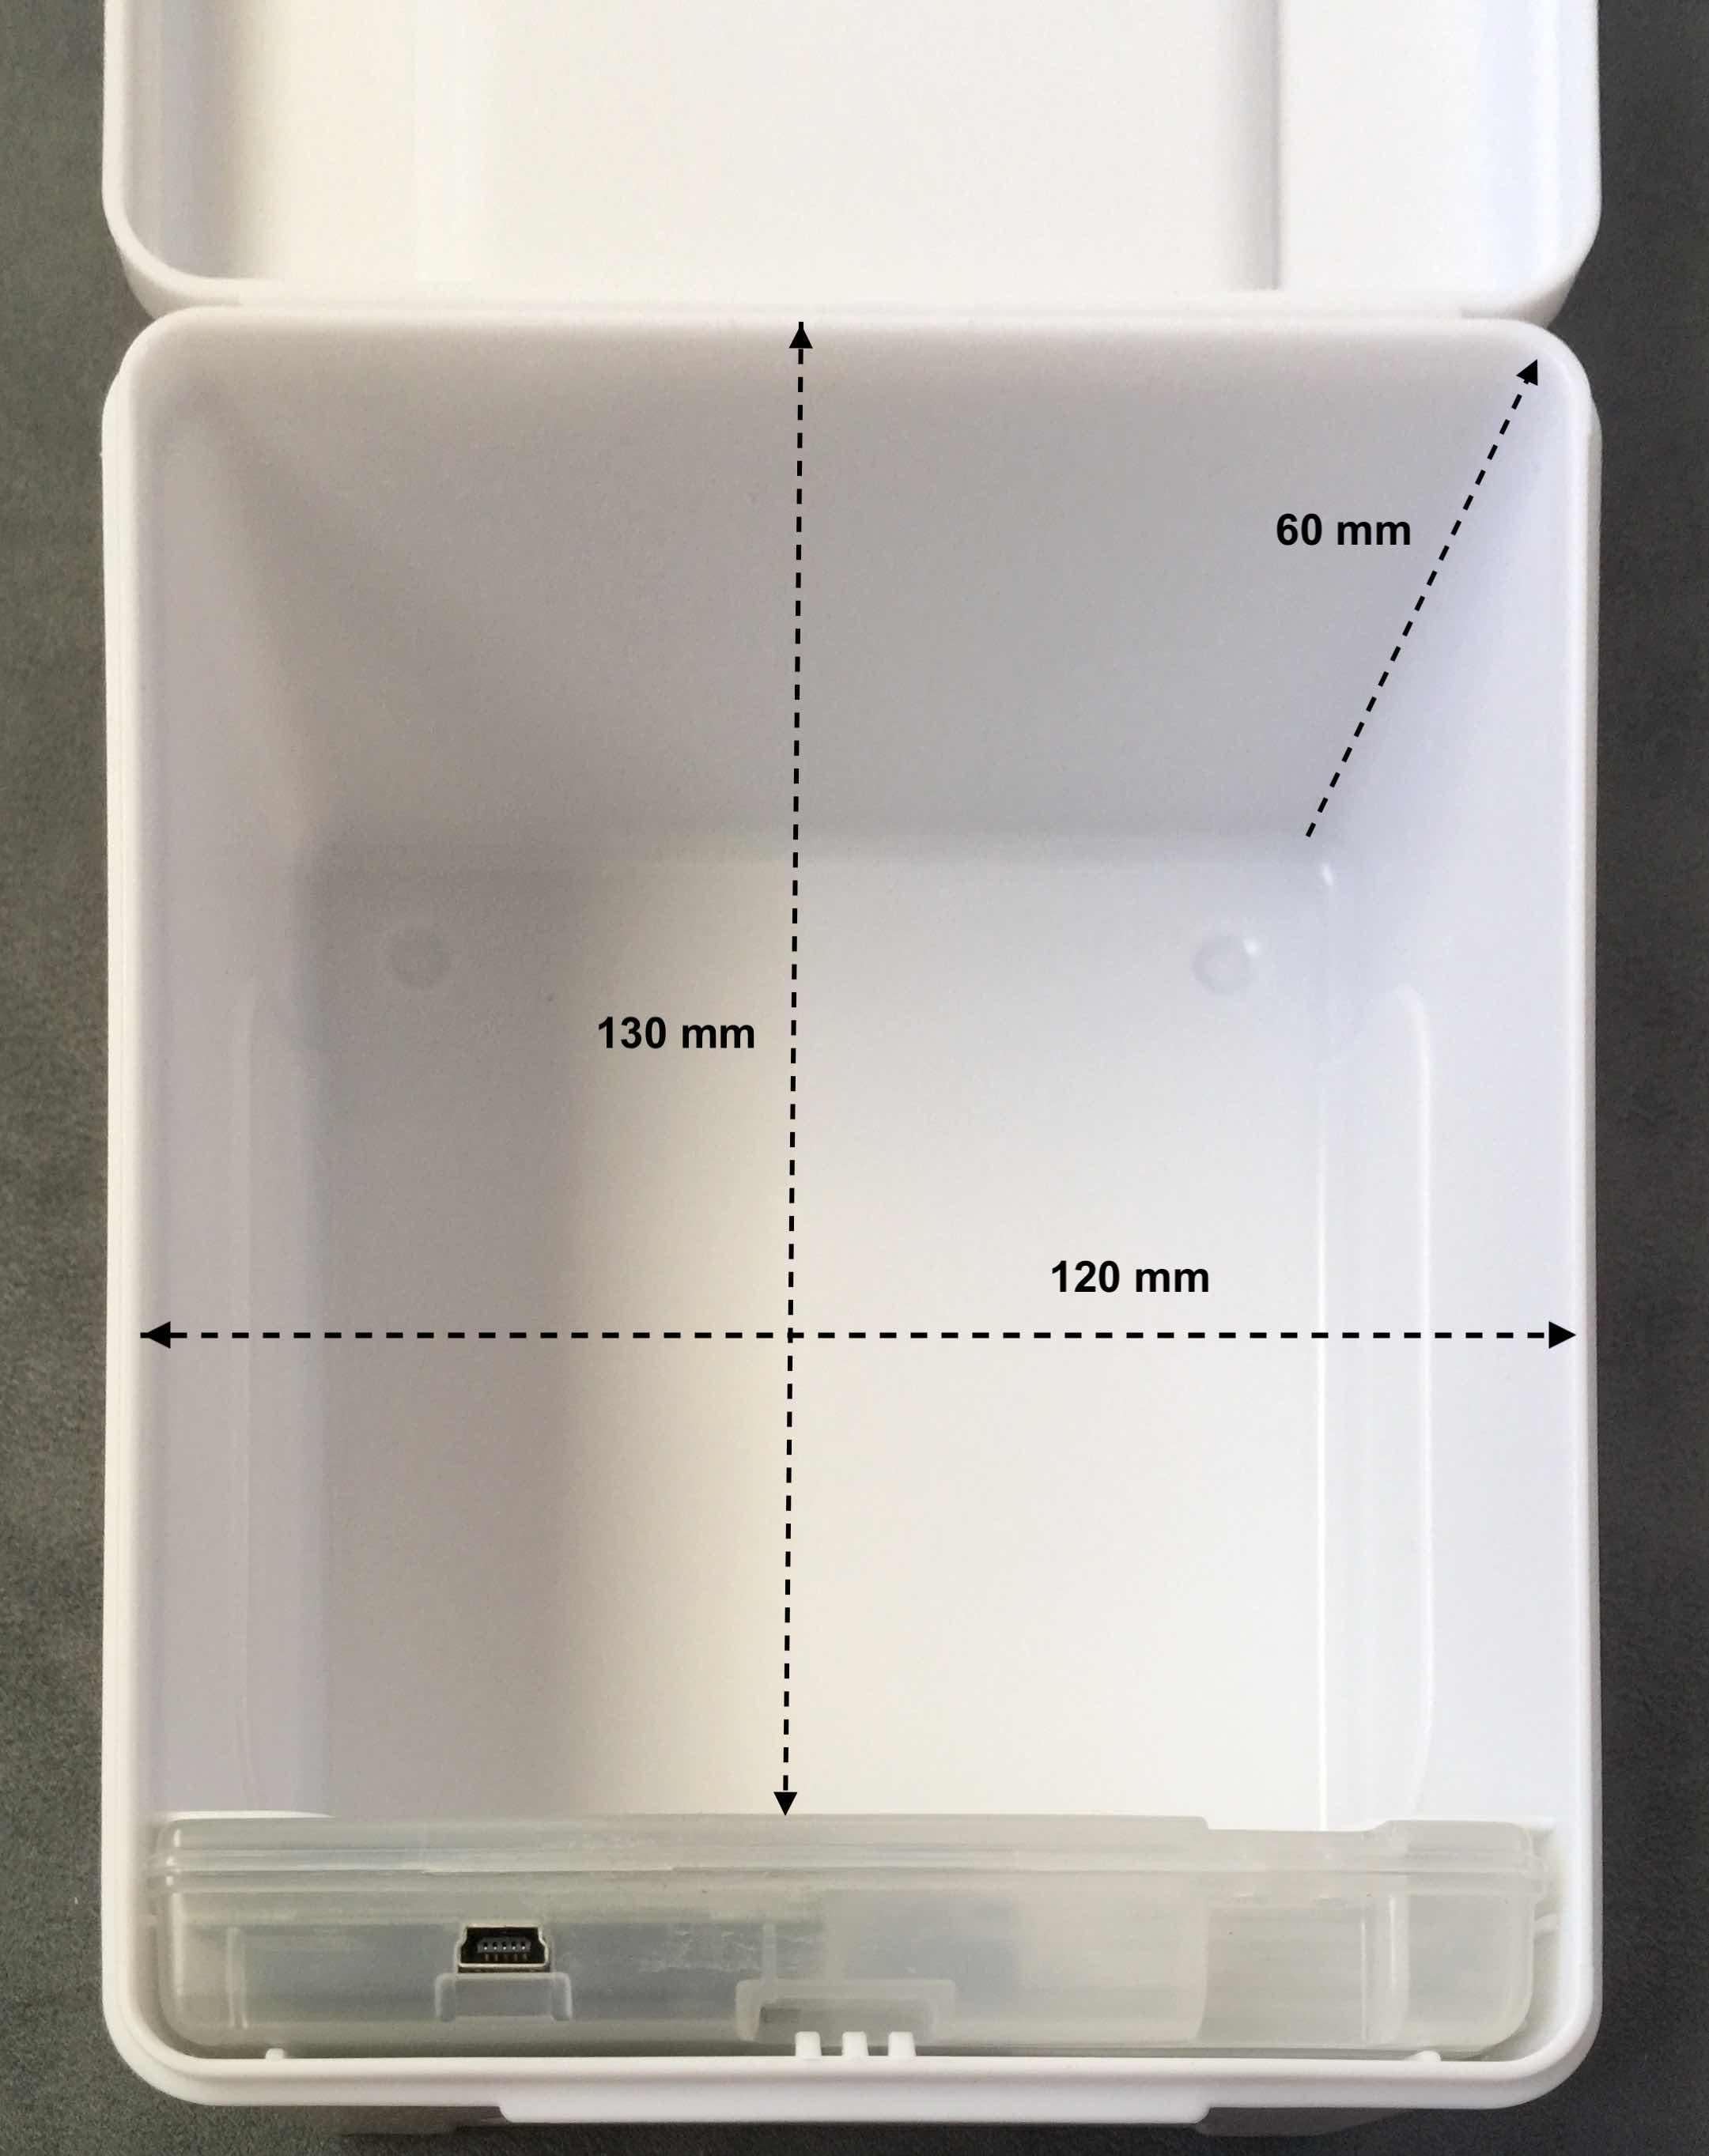 Cavity Dimensions (Standard)